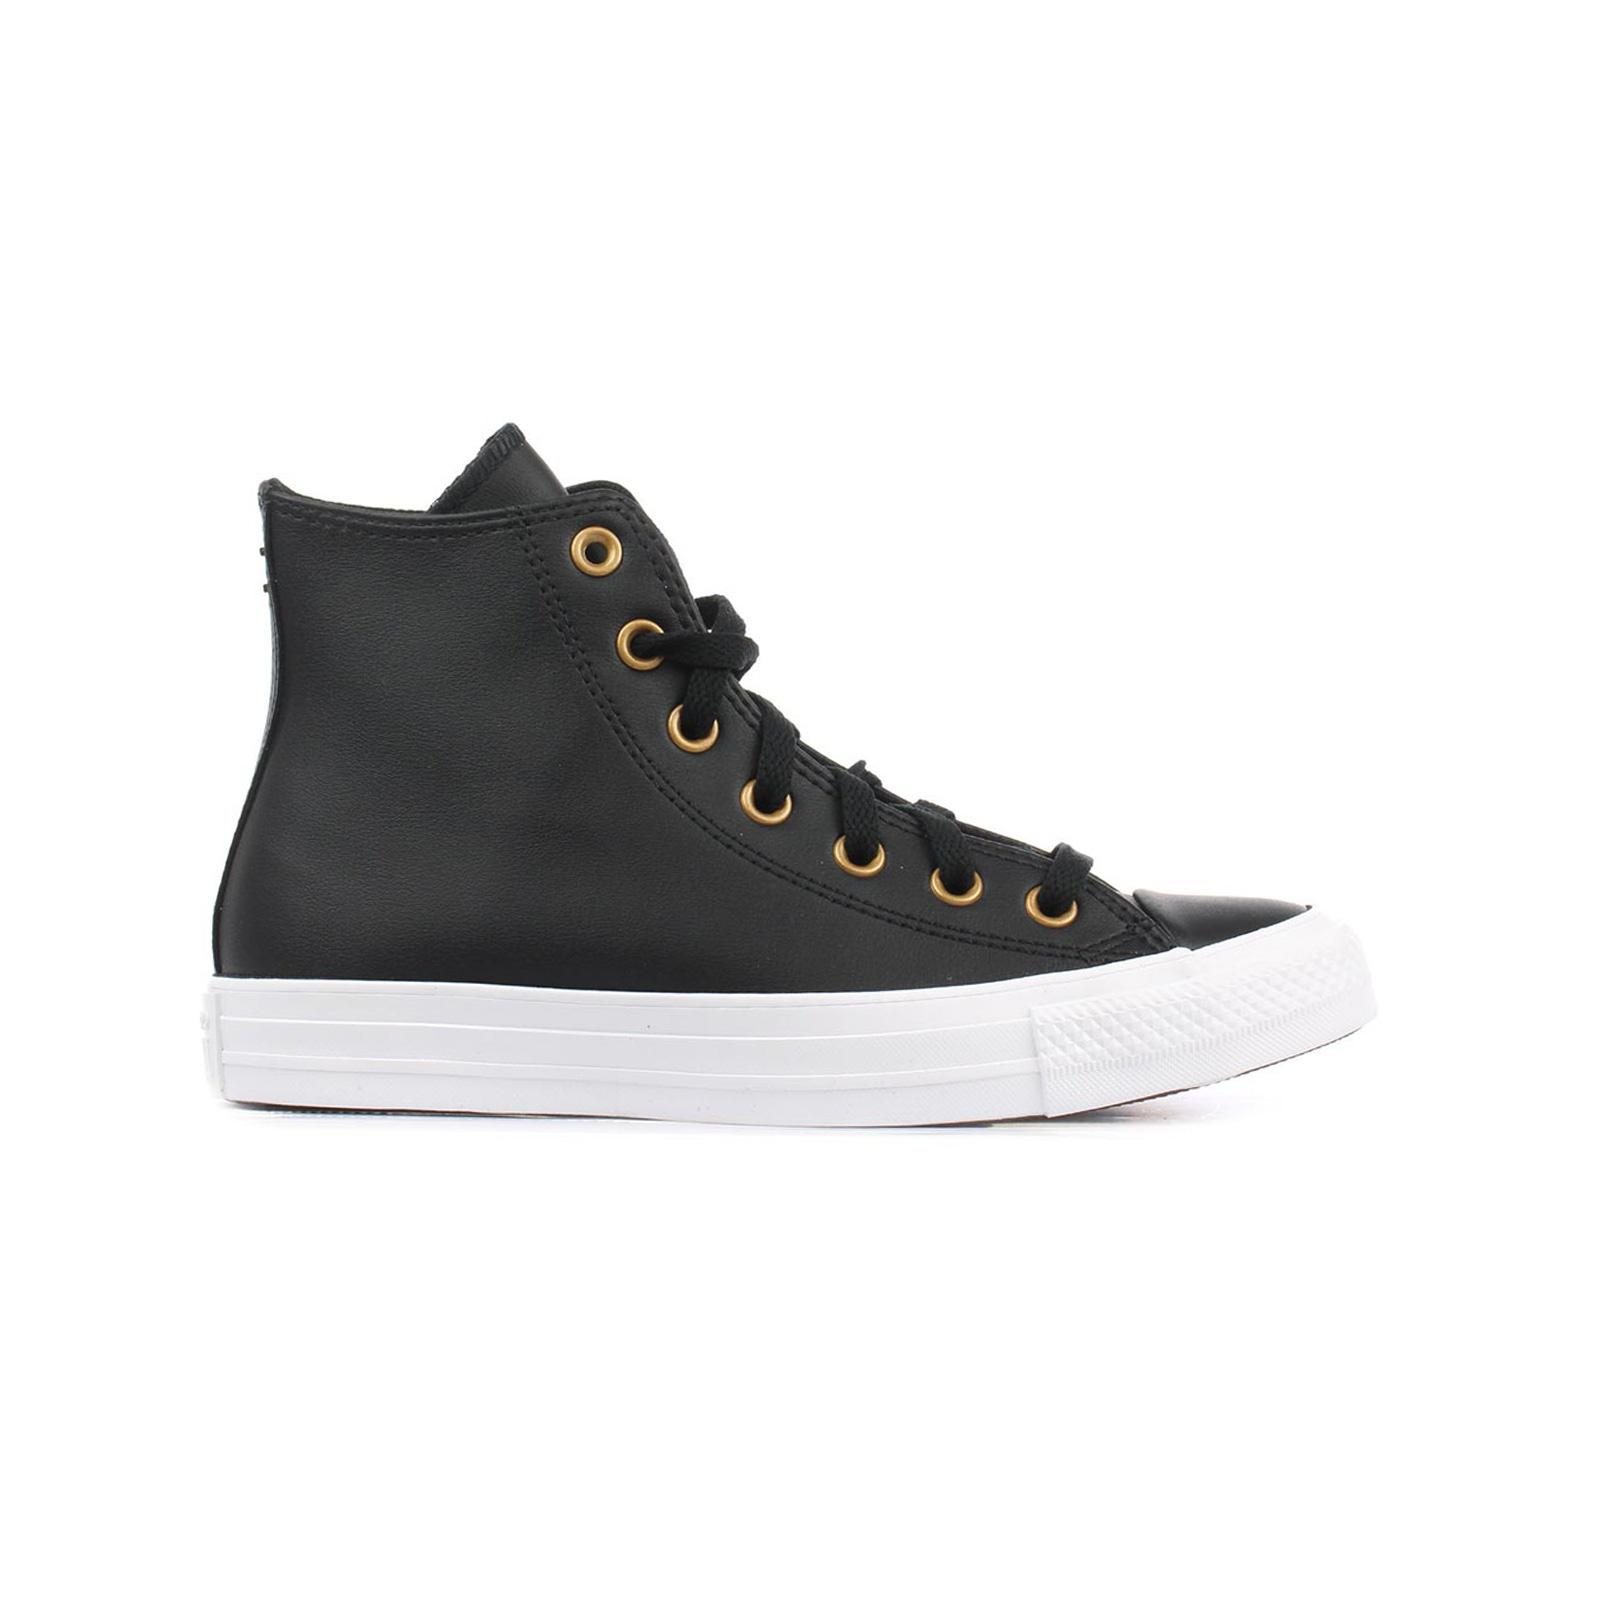 Converse - CHUCK TAYLOR ALL STAR - 001-BLACK/GOLD/WHITE